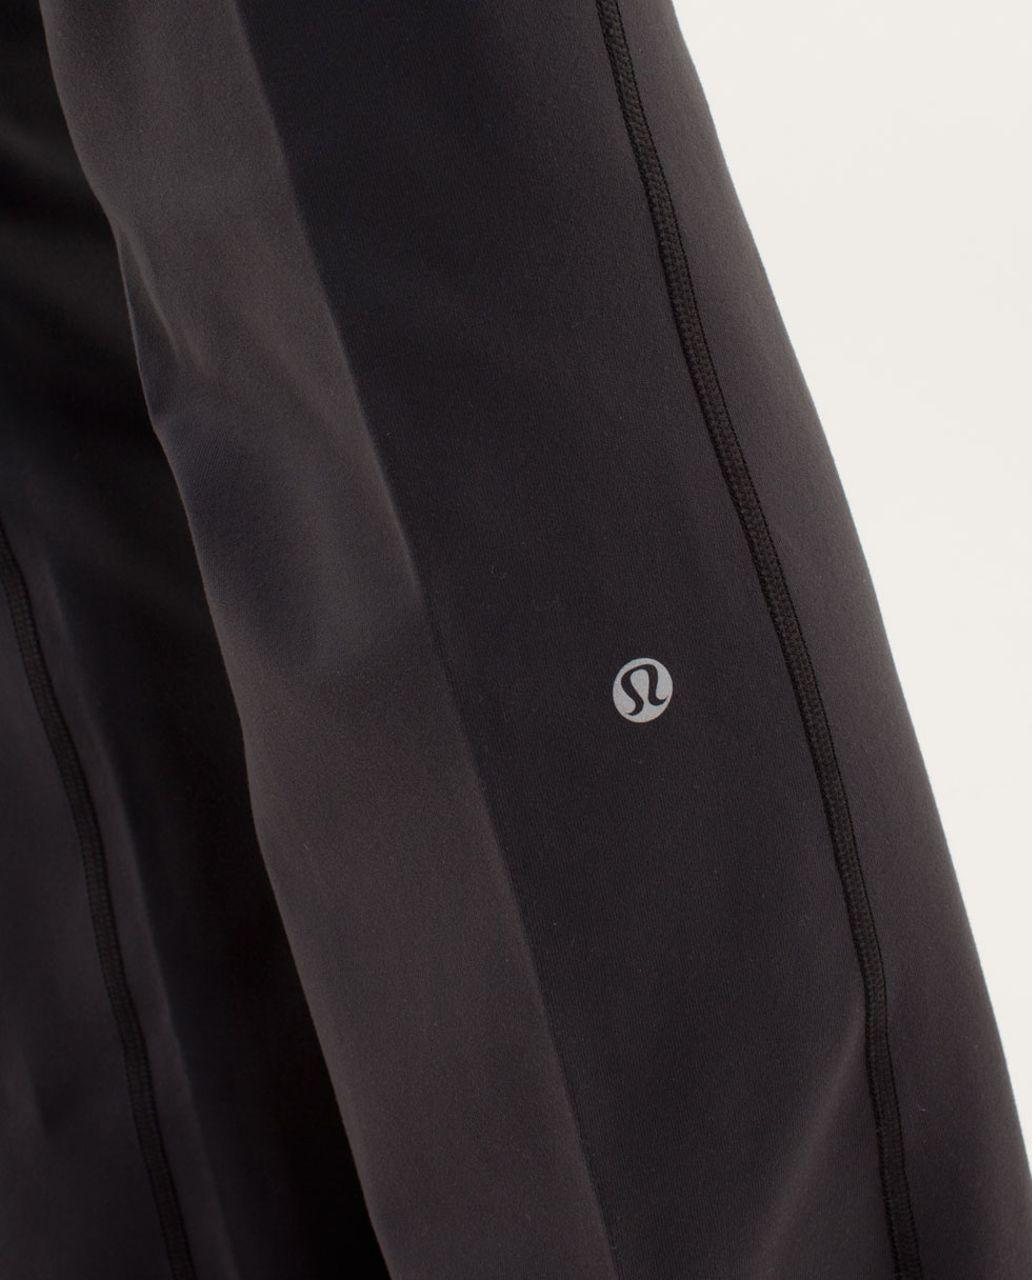 Lululemon Groove Pant (Regular) - Deep Coal / Currant / Fall 12 Quilt 14